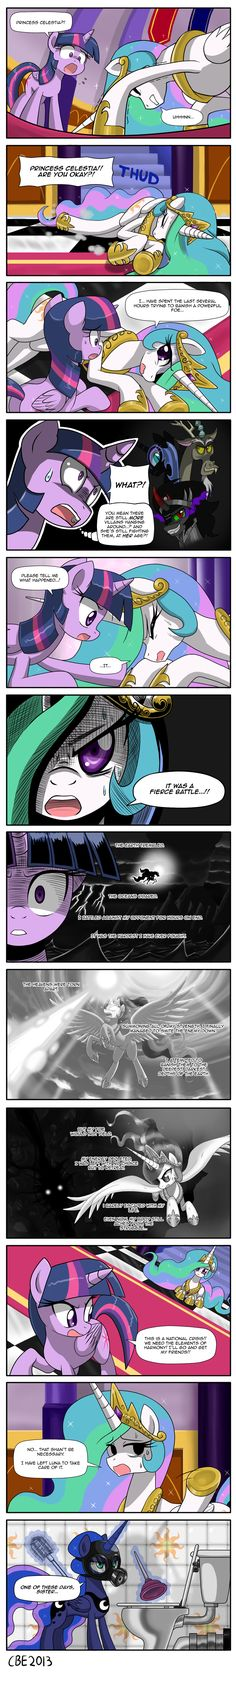 Princess Celestia's battle by CrimsonBugEye on deviantART